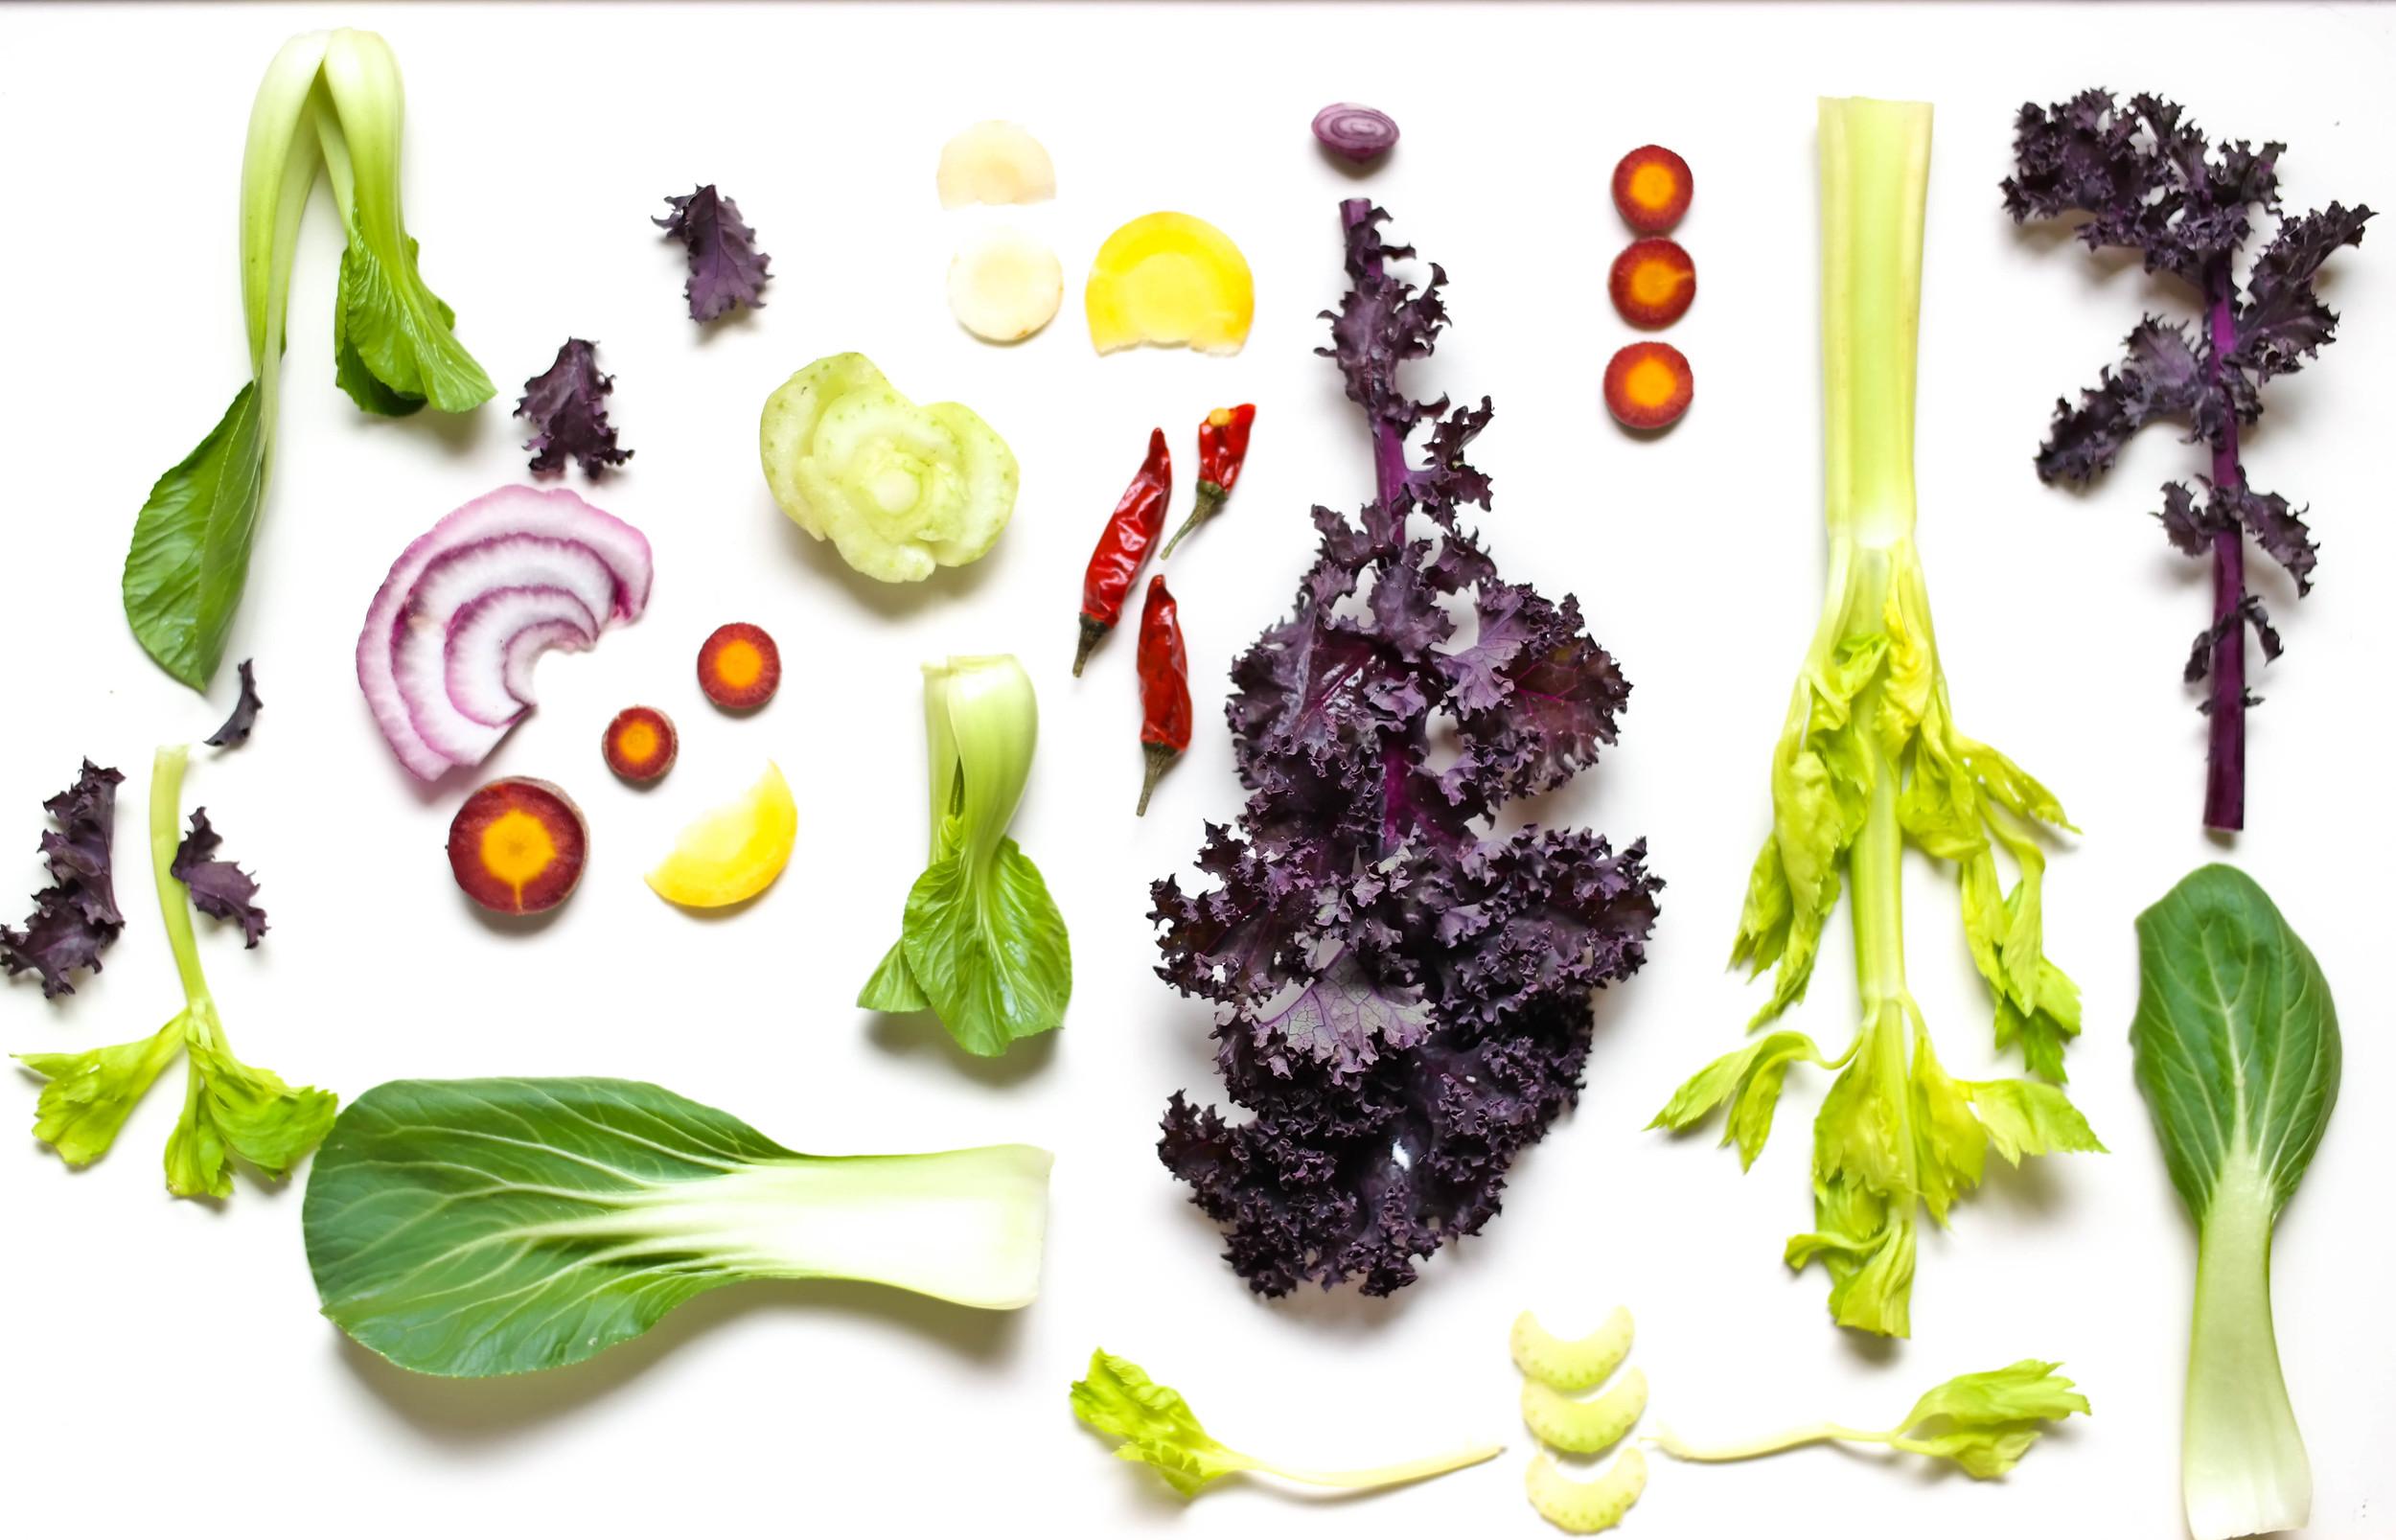 2-Warming-Vegetable-and-Black-Eyed-Peas-Soup | www.8thandlake.com